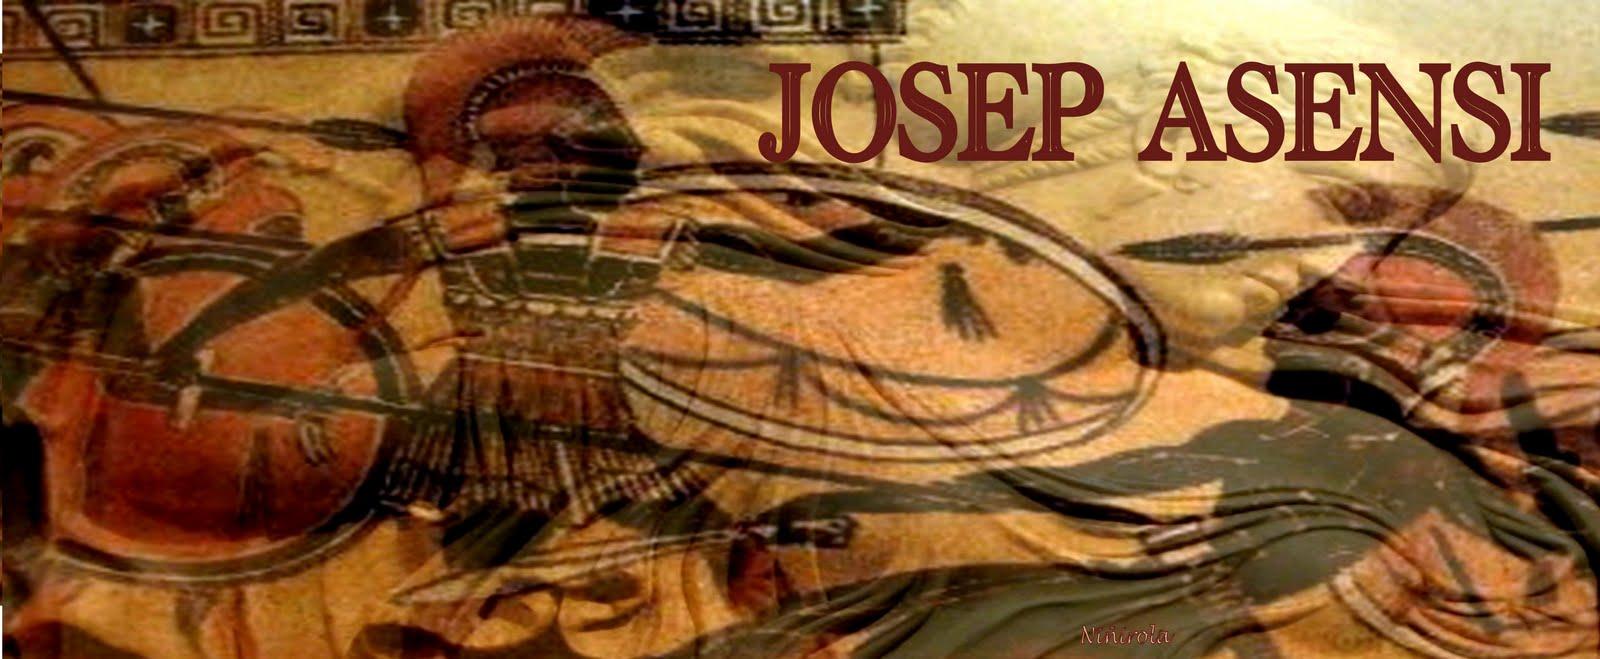 Josep Asensi